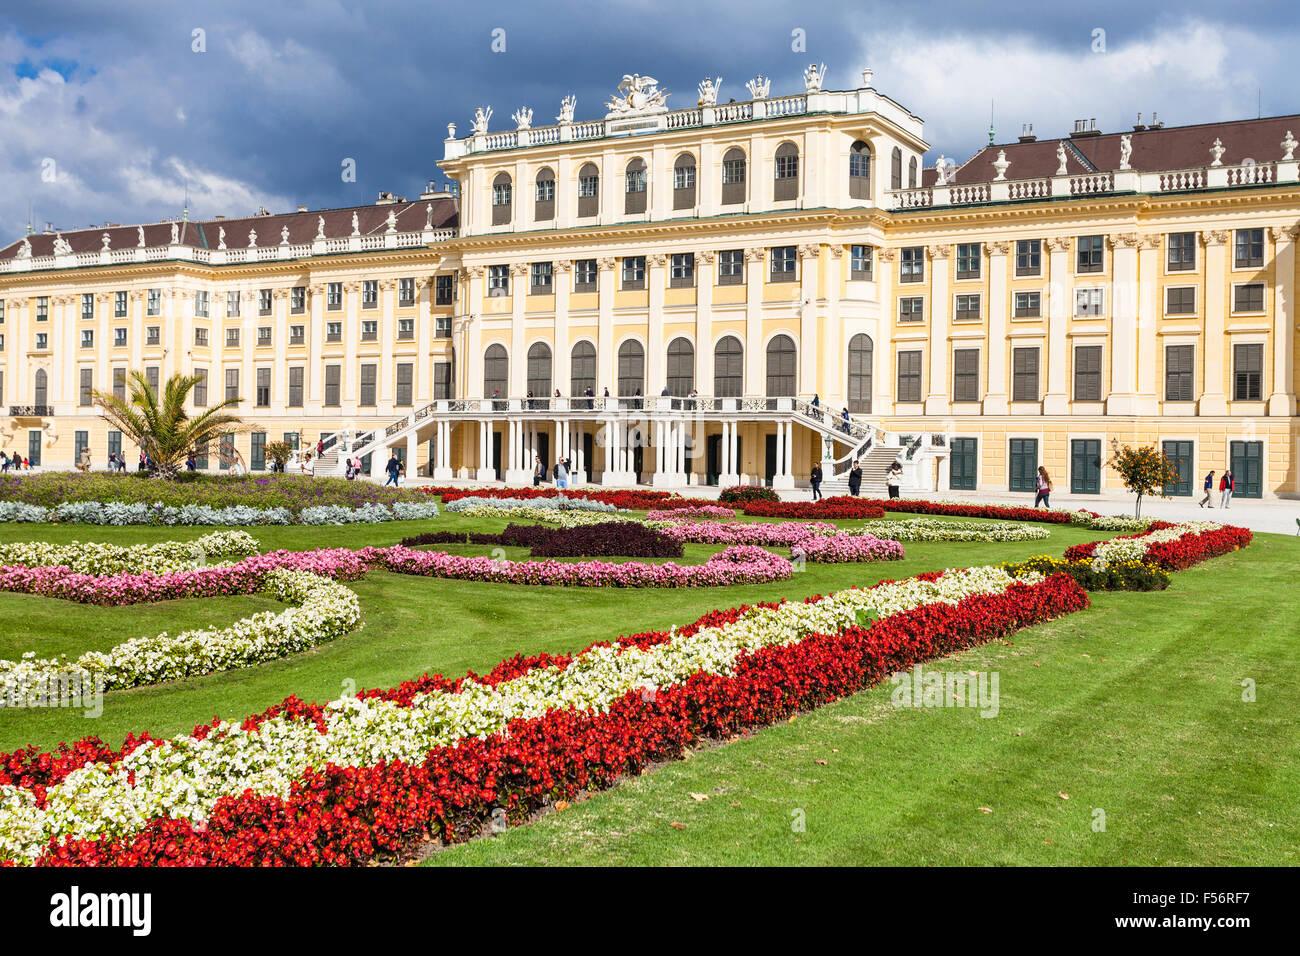 travel to Vienna city - flowers in garden of Schloss Schonbrunn palace, Vienna, Austria - Stock Image